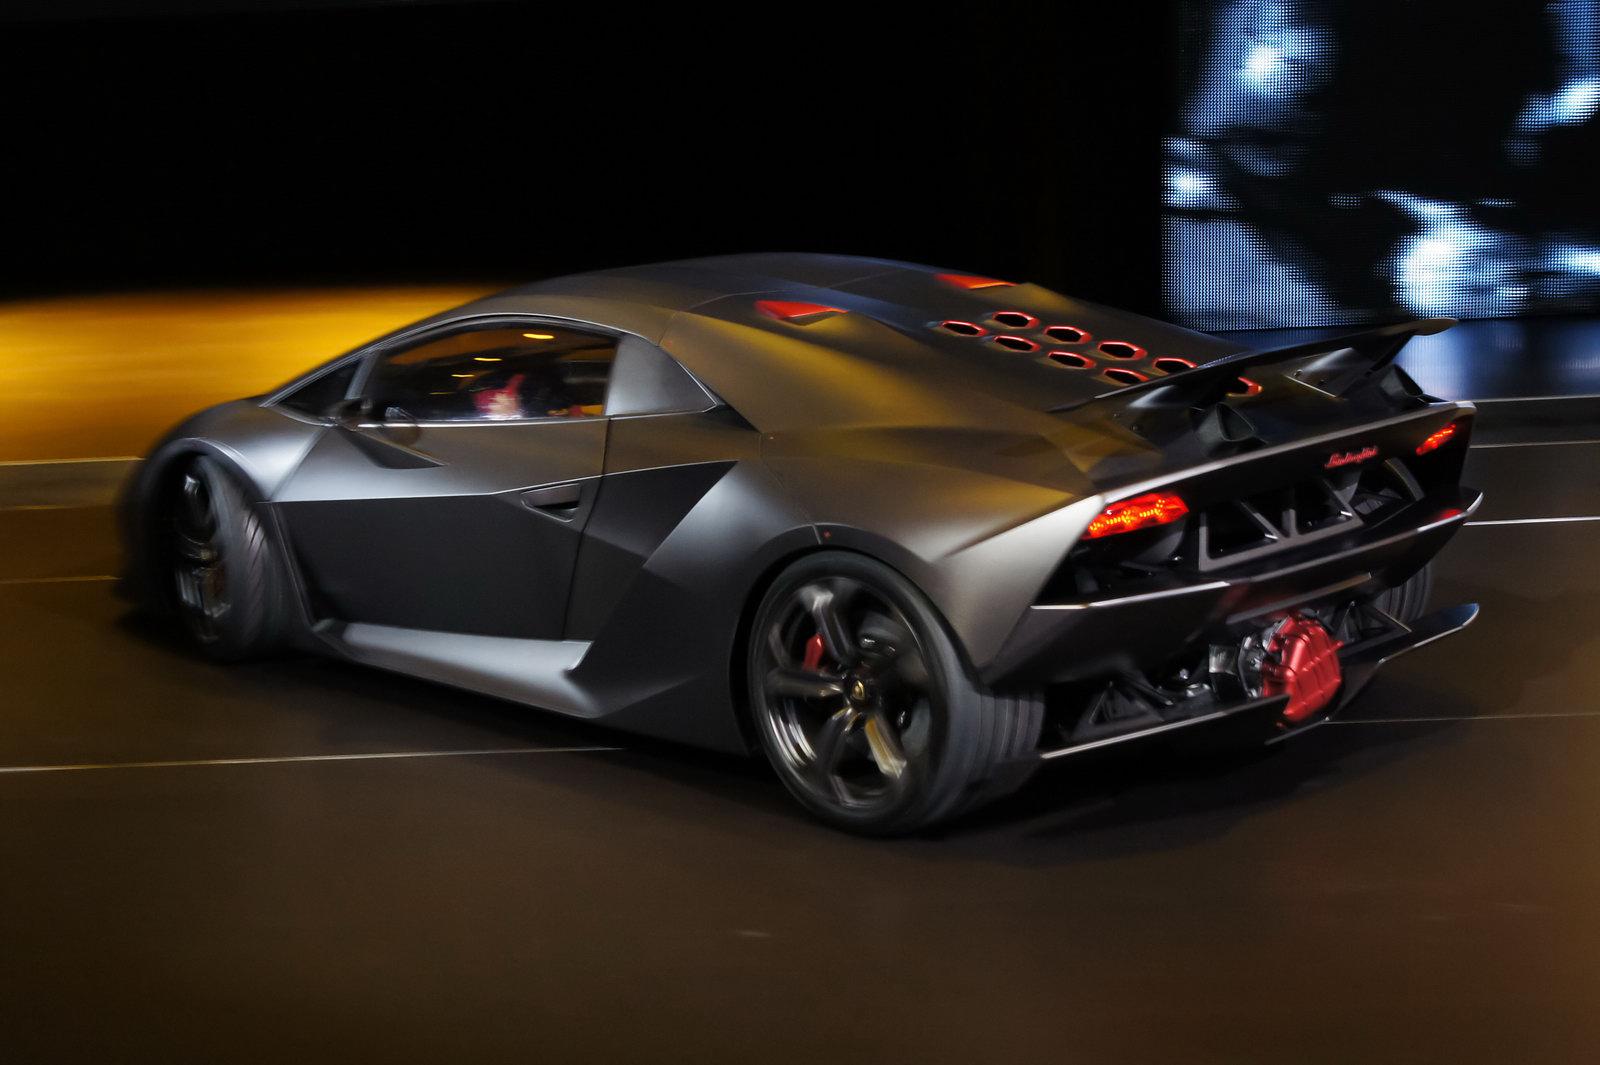 http://4.bp.blogspot.com/-W_uG7vkZFYA/UNUsPI2Lt4I/AAAAAAAAJ0s/yev6ra1vGpE/s1600/Lamborghini-Sesto-Elemento-3.jpg